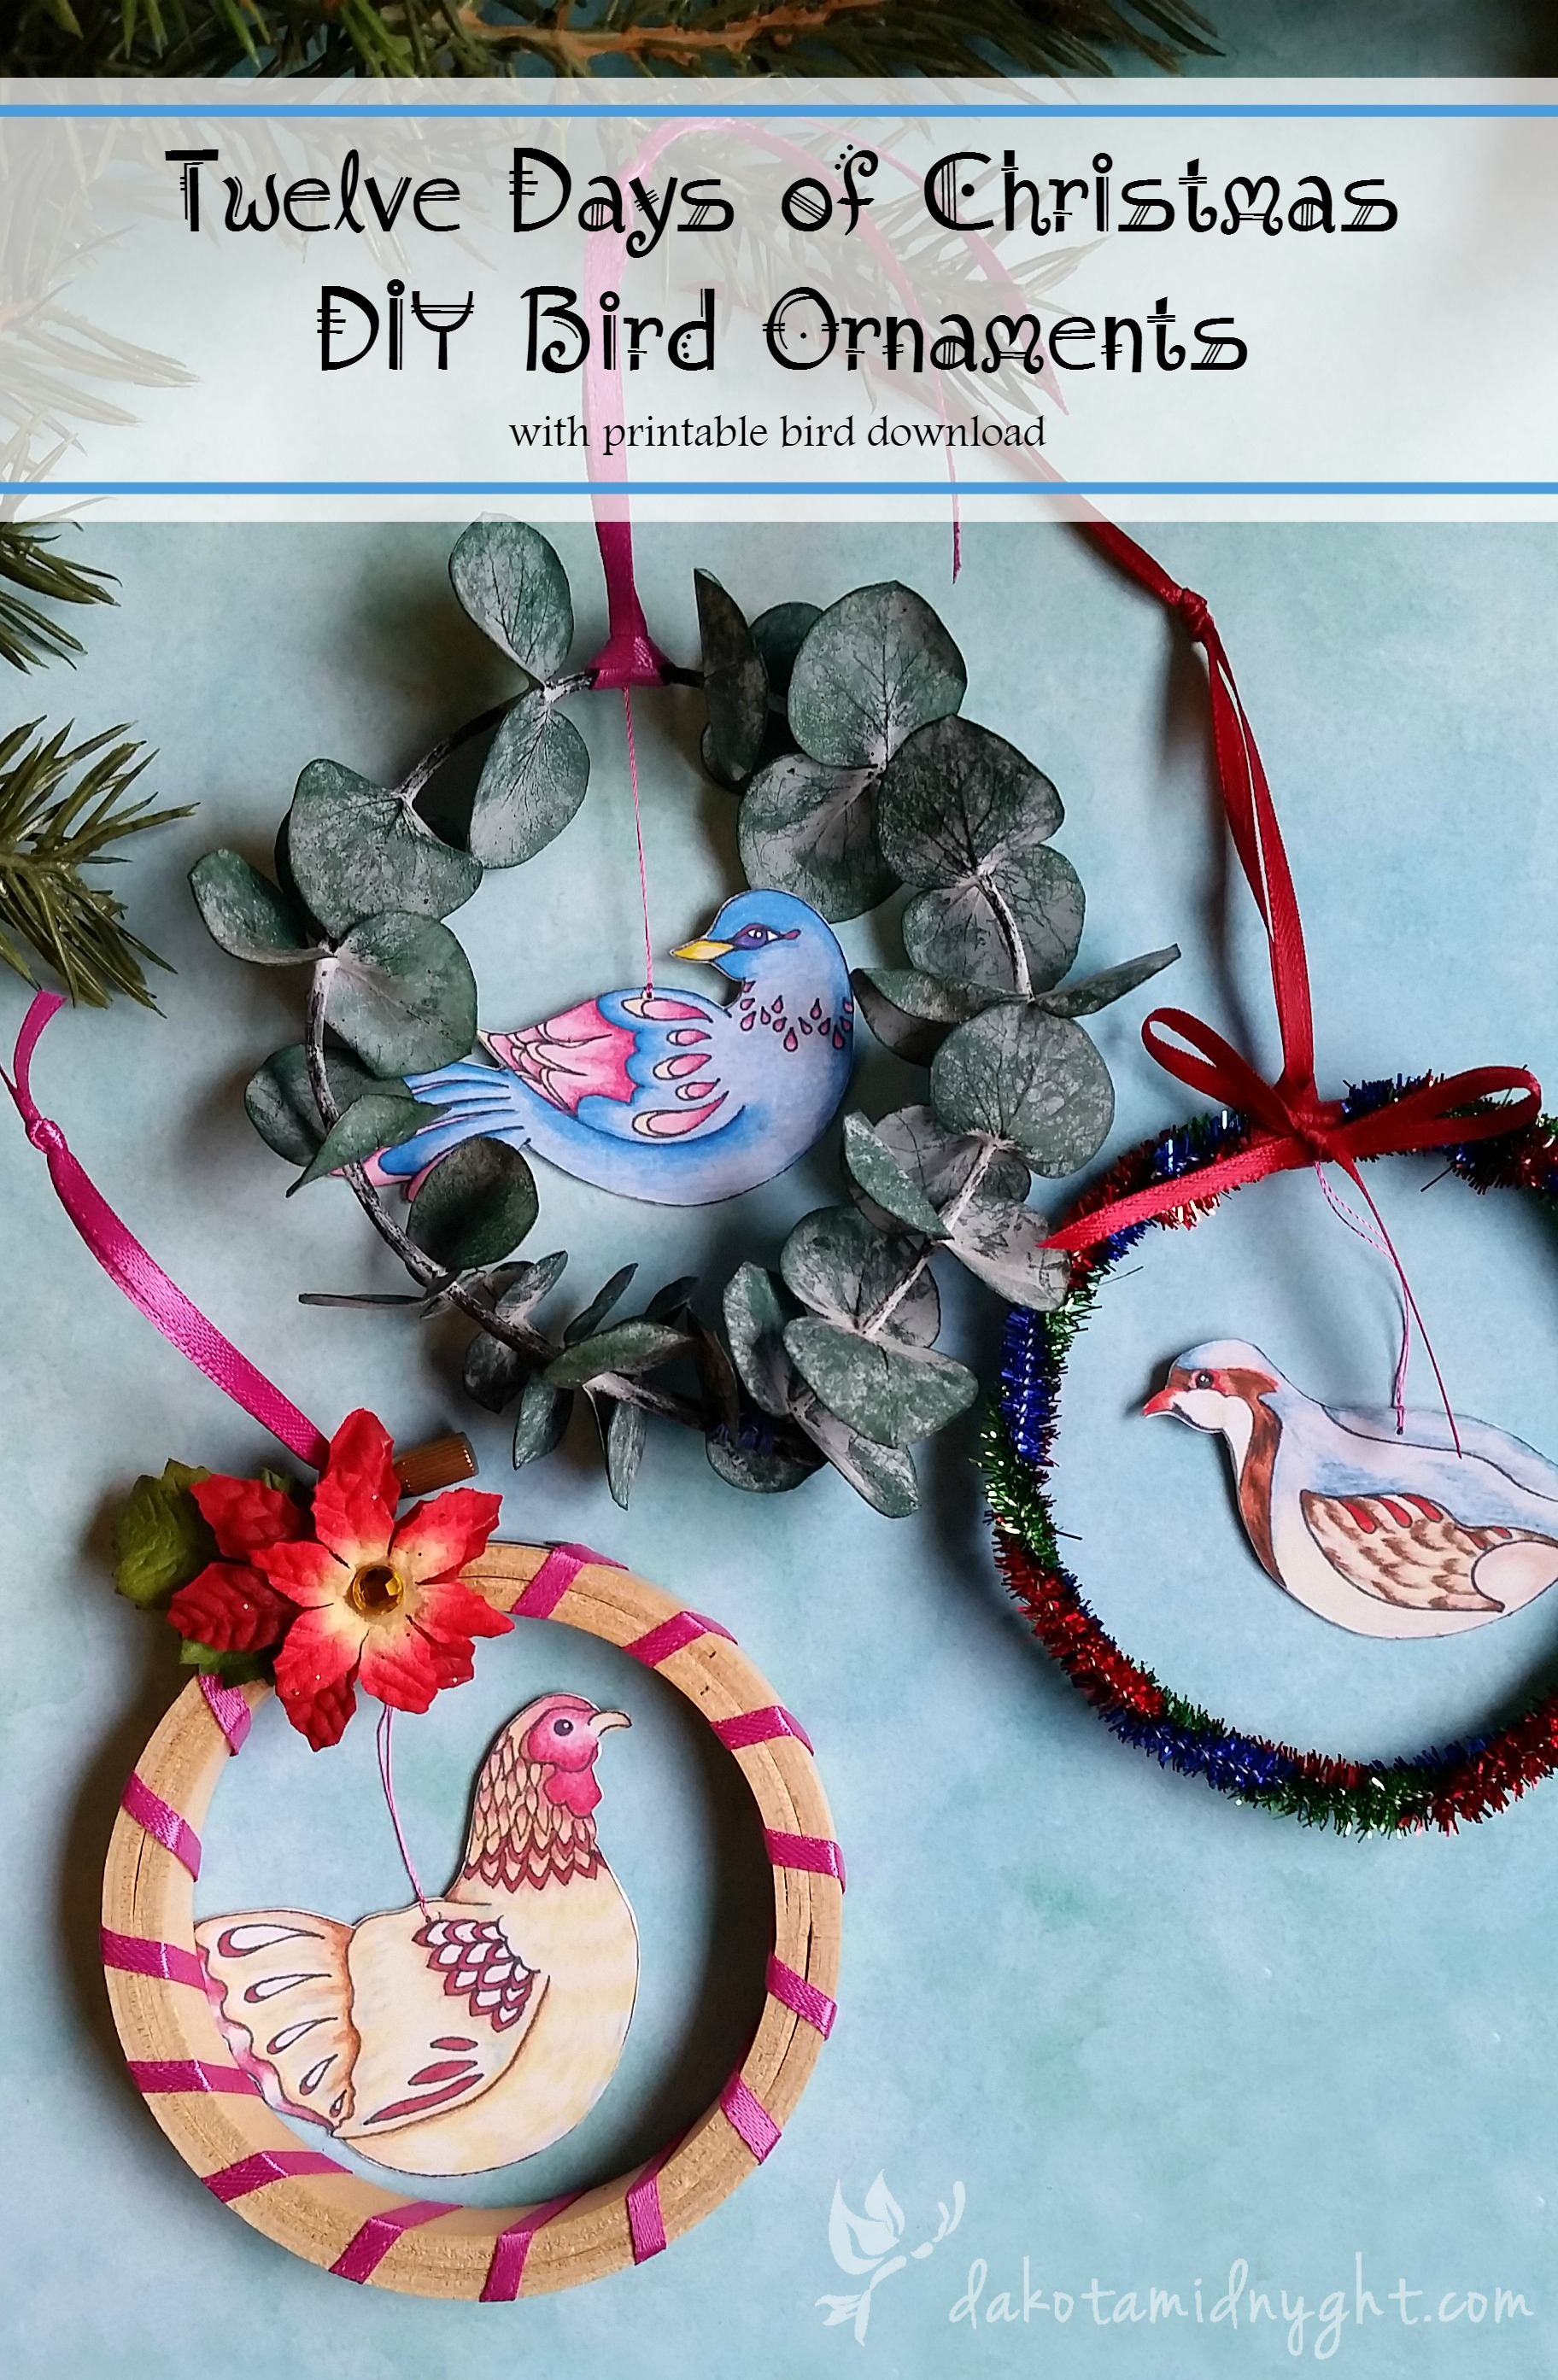 Free printable download for Twelve Days of Christmas DIY Bird Ornaments | dakotamidnyght.com